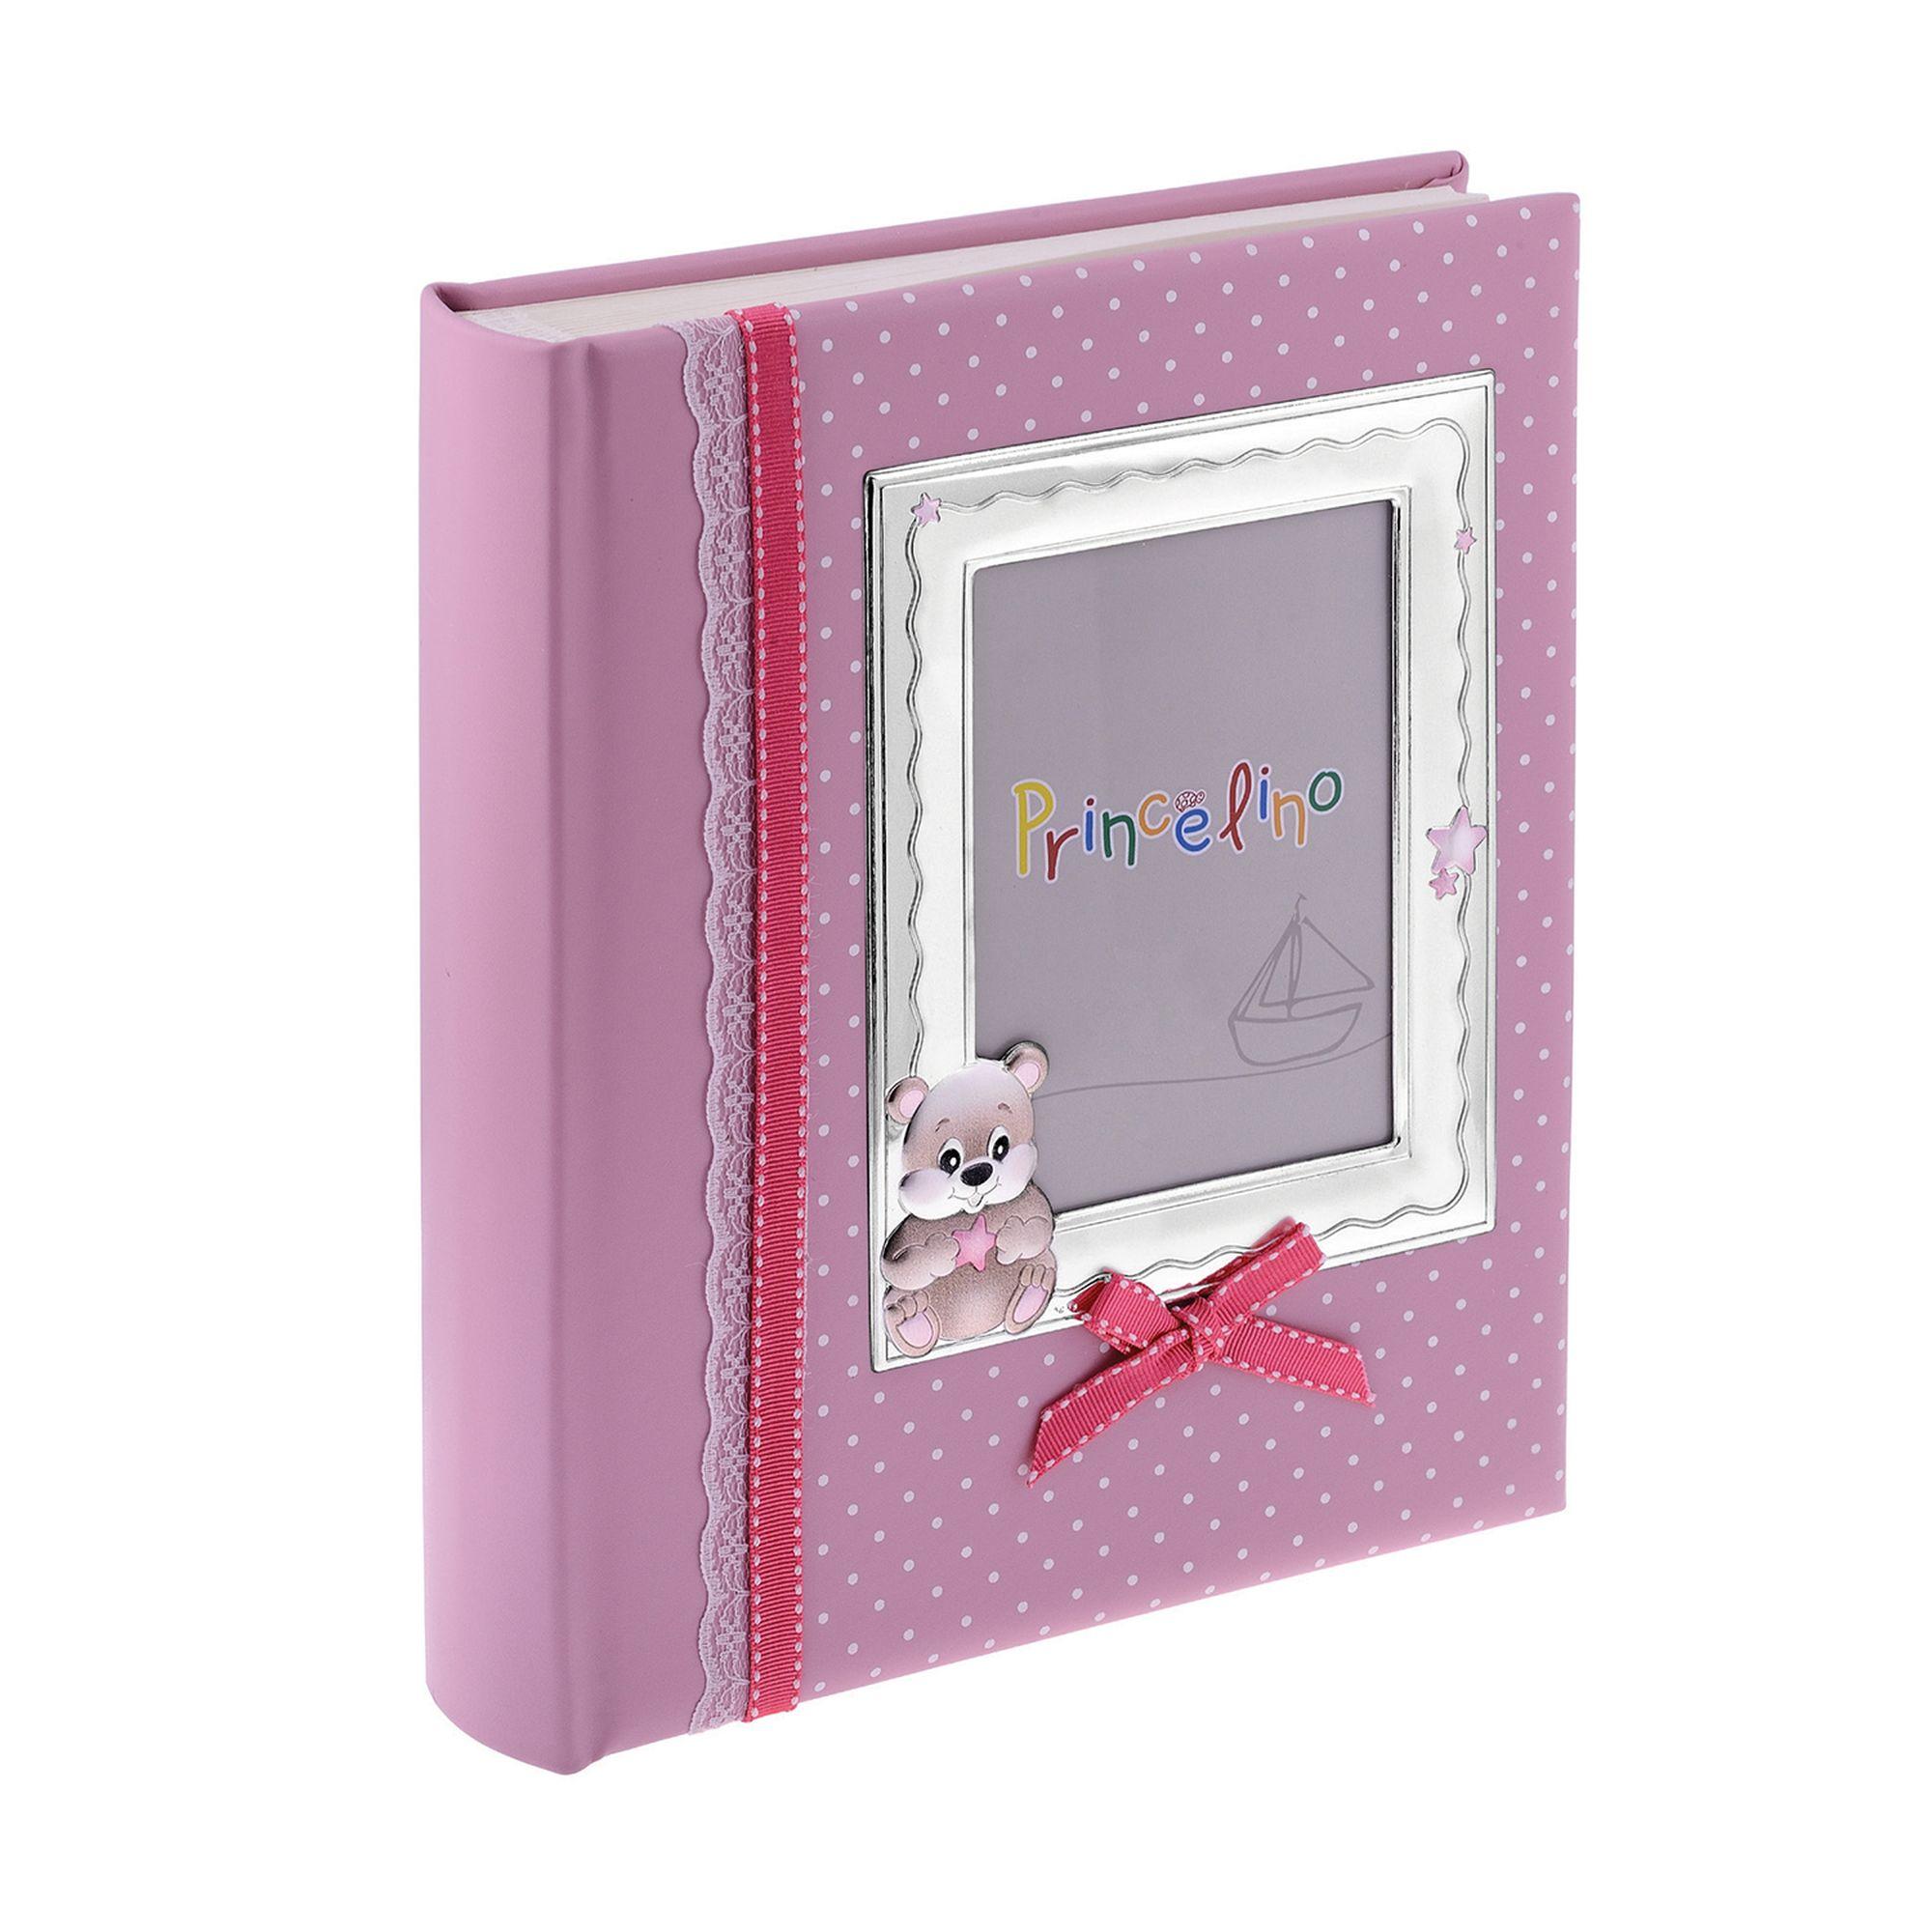 Princelino Παιδικό Αλμπουμ για Κοριτσάκι σε Ροζ Χρώμα